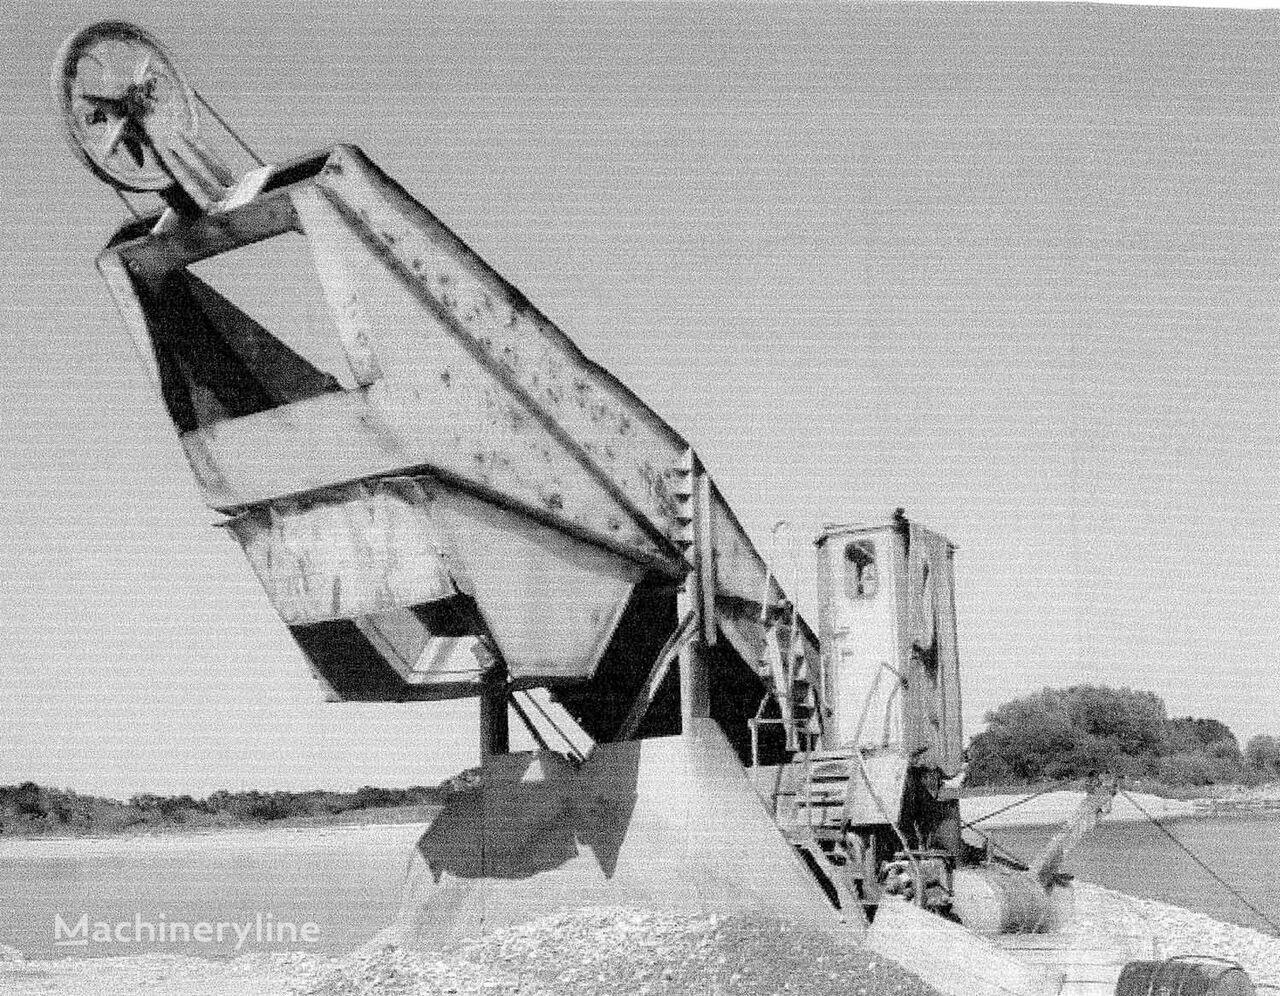 dragline Stichweh KS400S